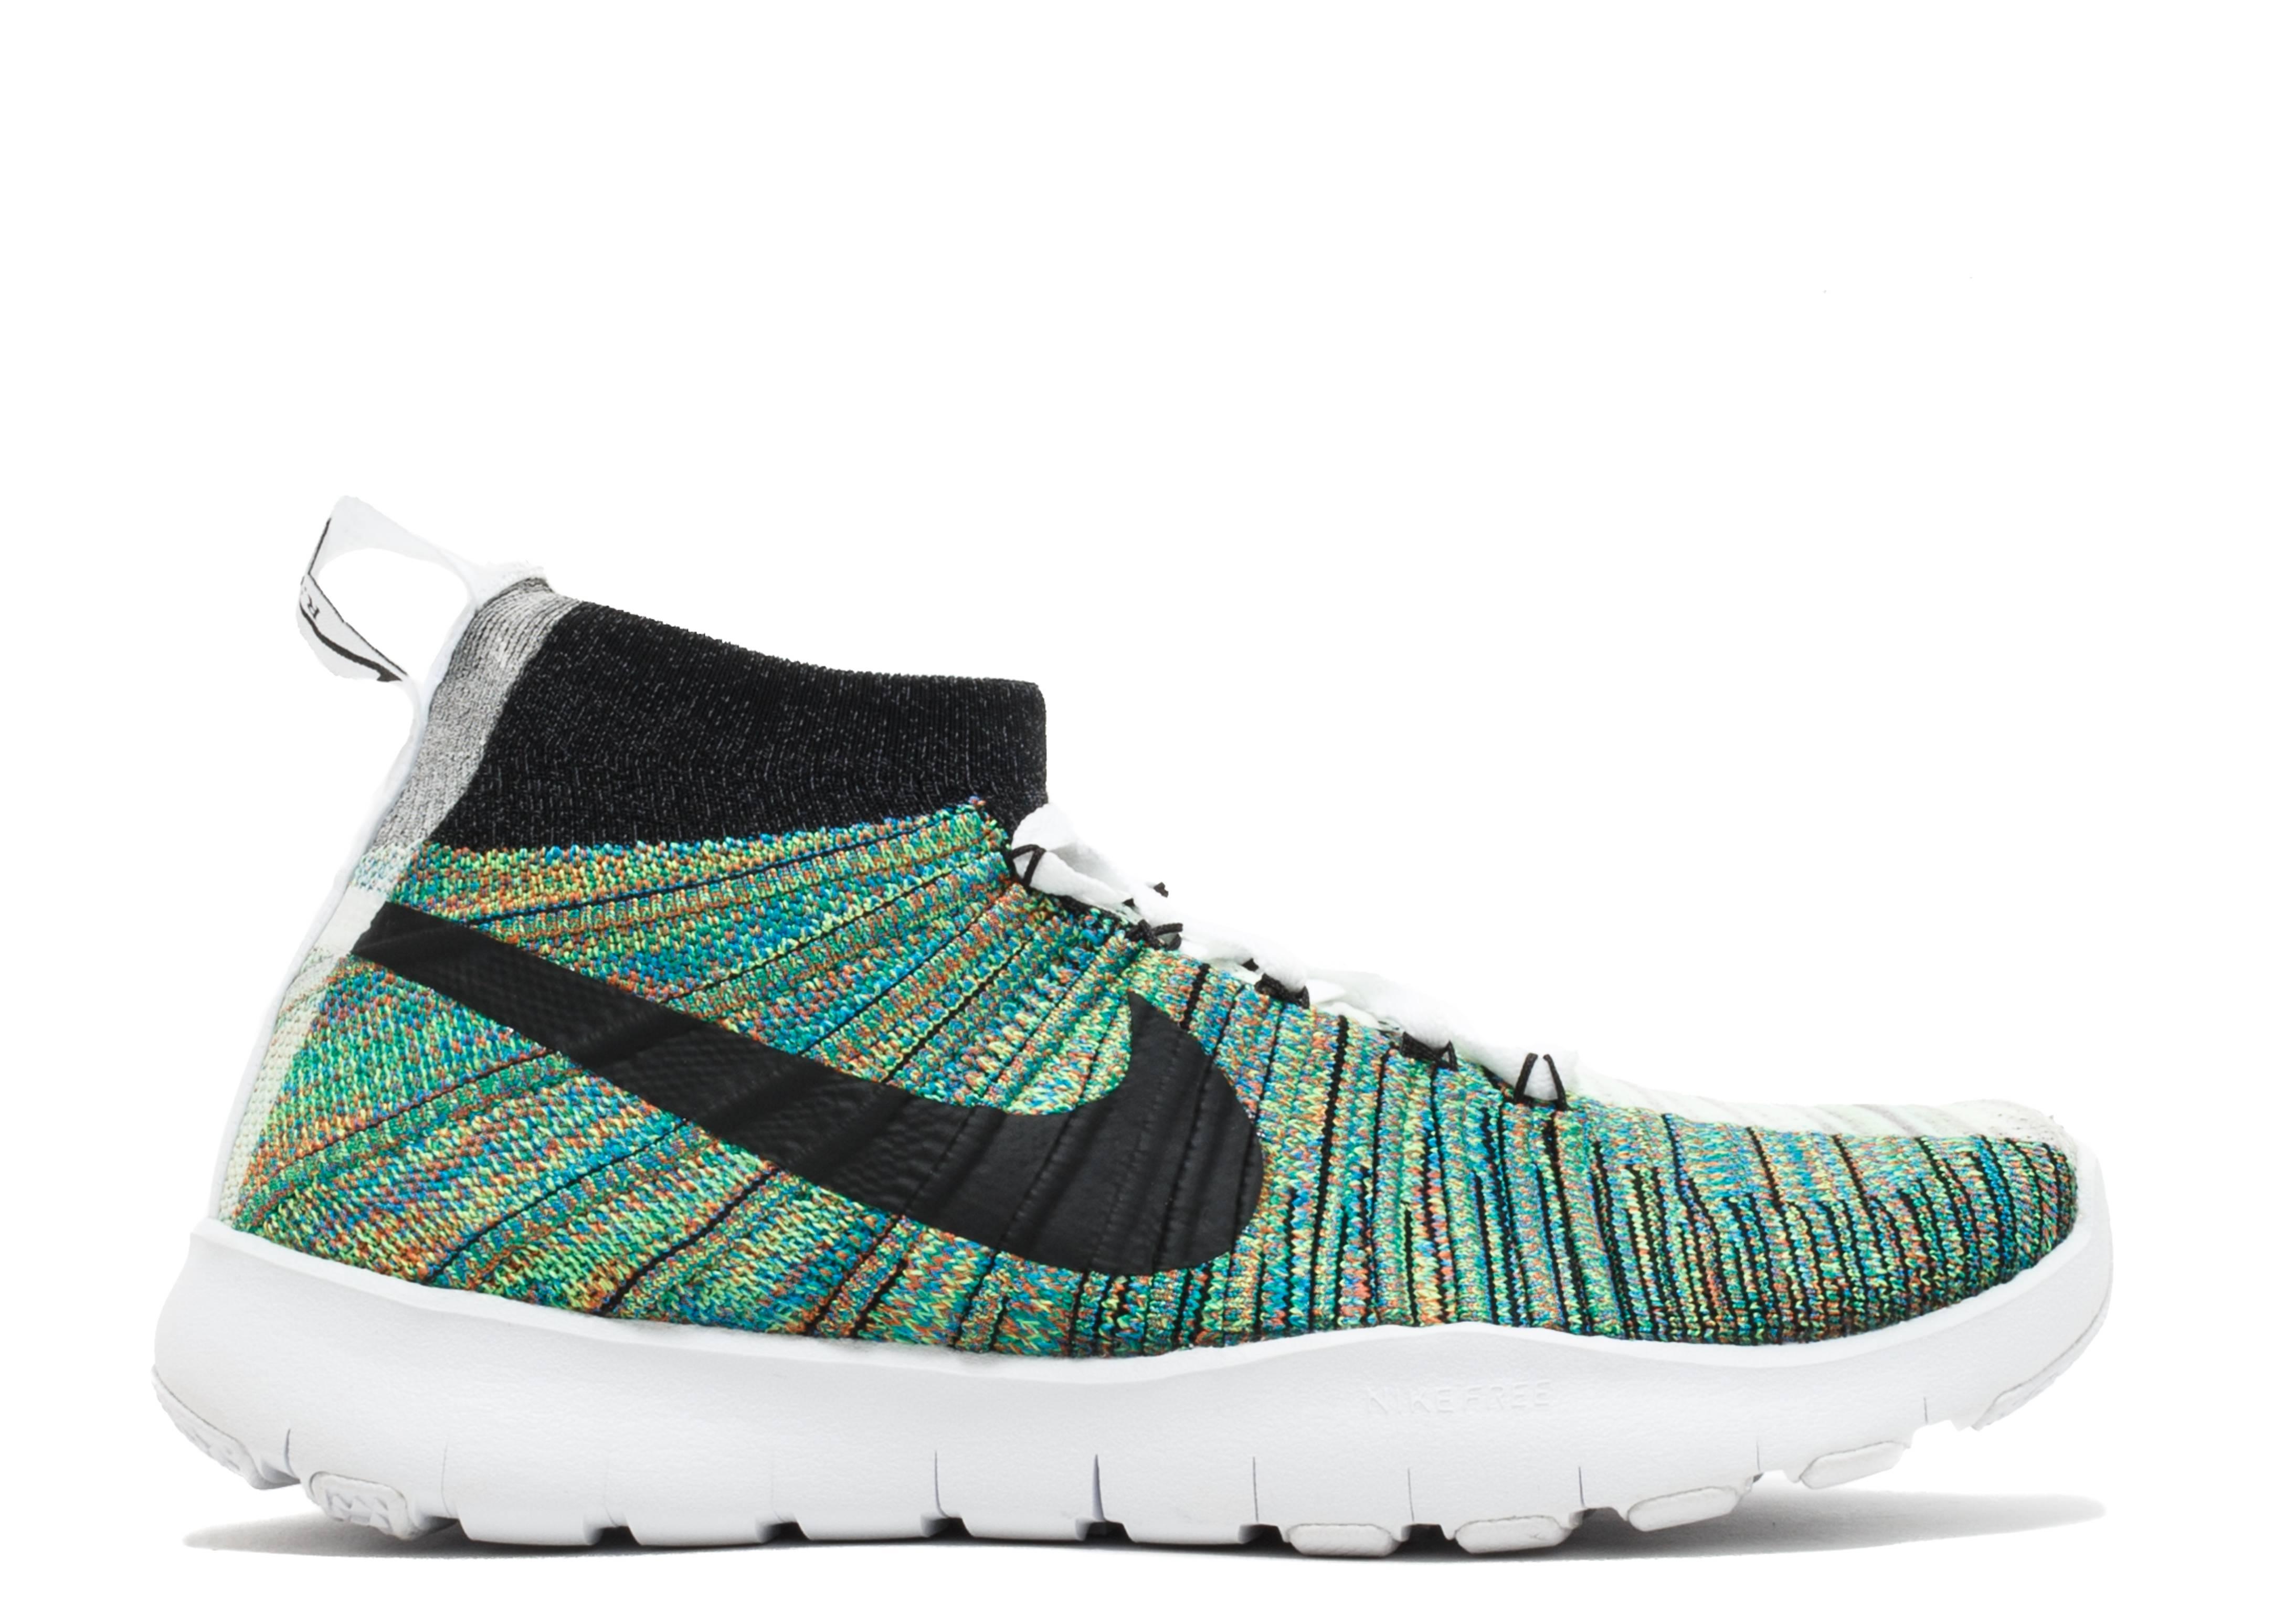 749886e1286d Free TR Force Flyknit Premium - Nike - 844461 910 - multi-color ...